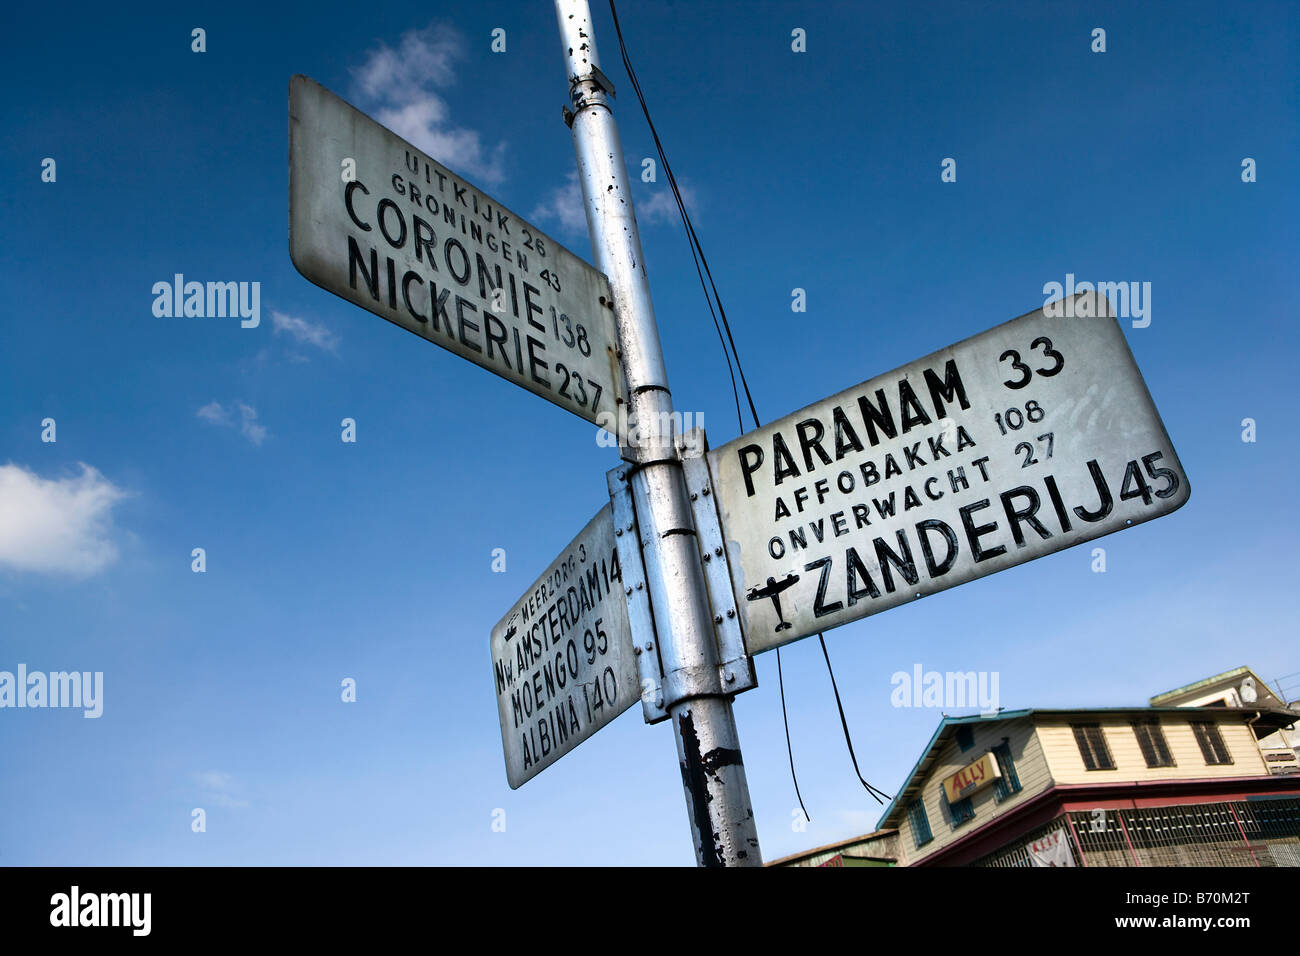 Suriname, Paramaribo, roadsigns in Dutch language in city center. - Stock Image